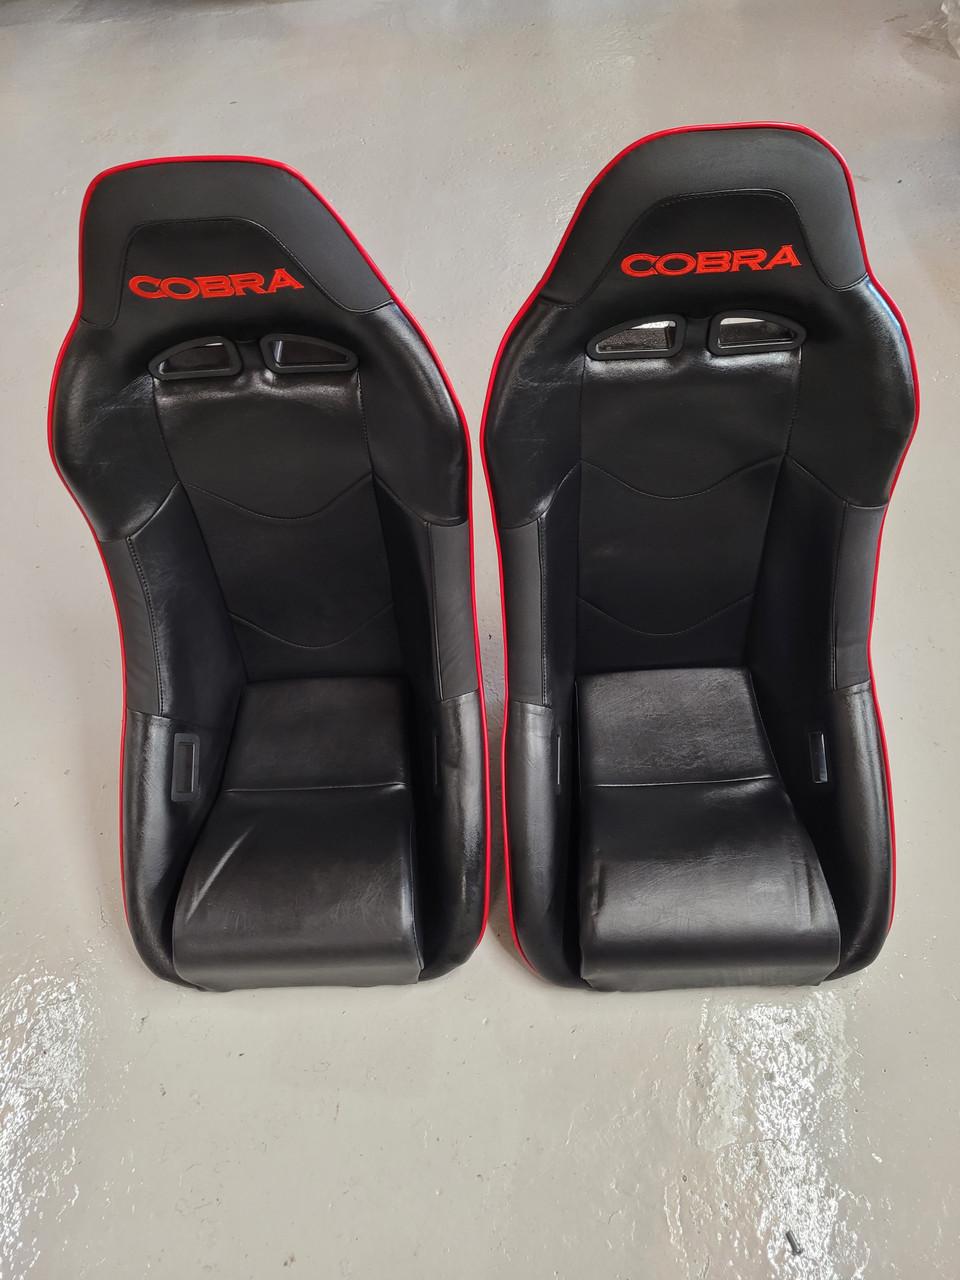 Cobra Clubman Black Red Piping Vinyl Seats T8